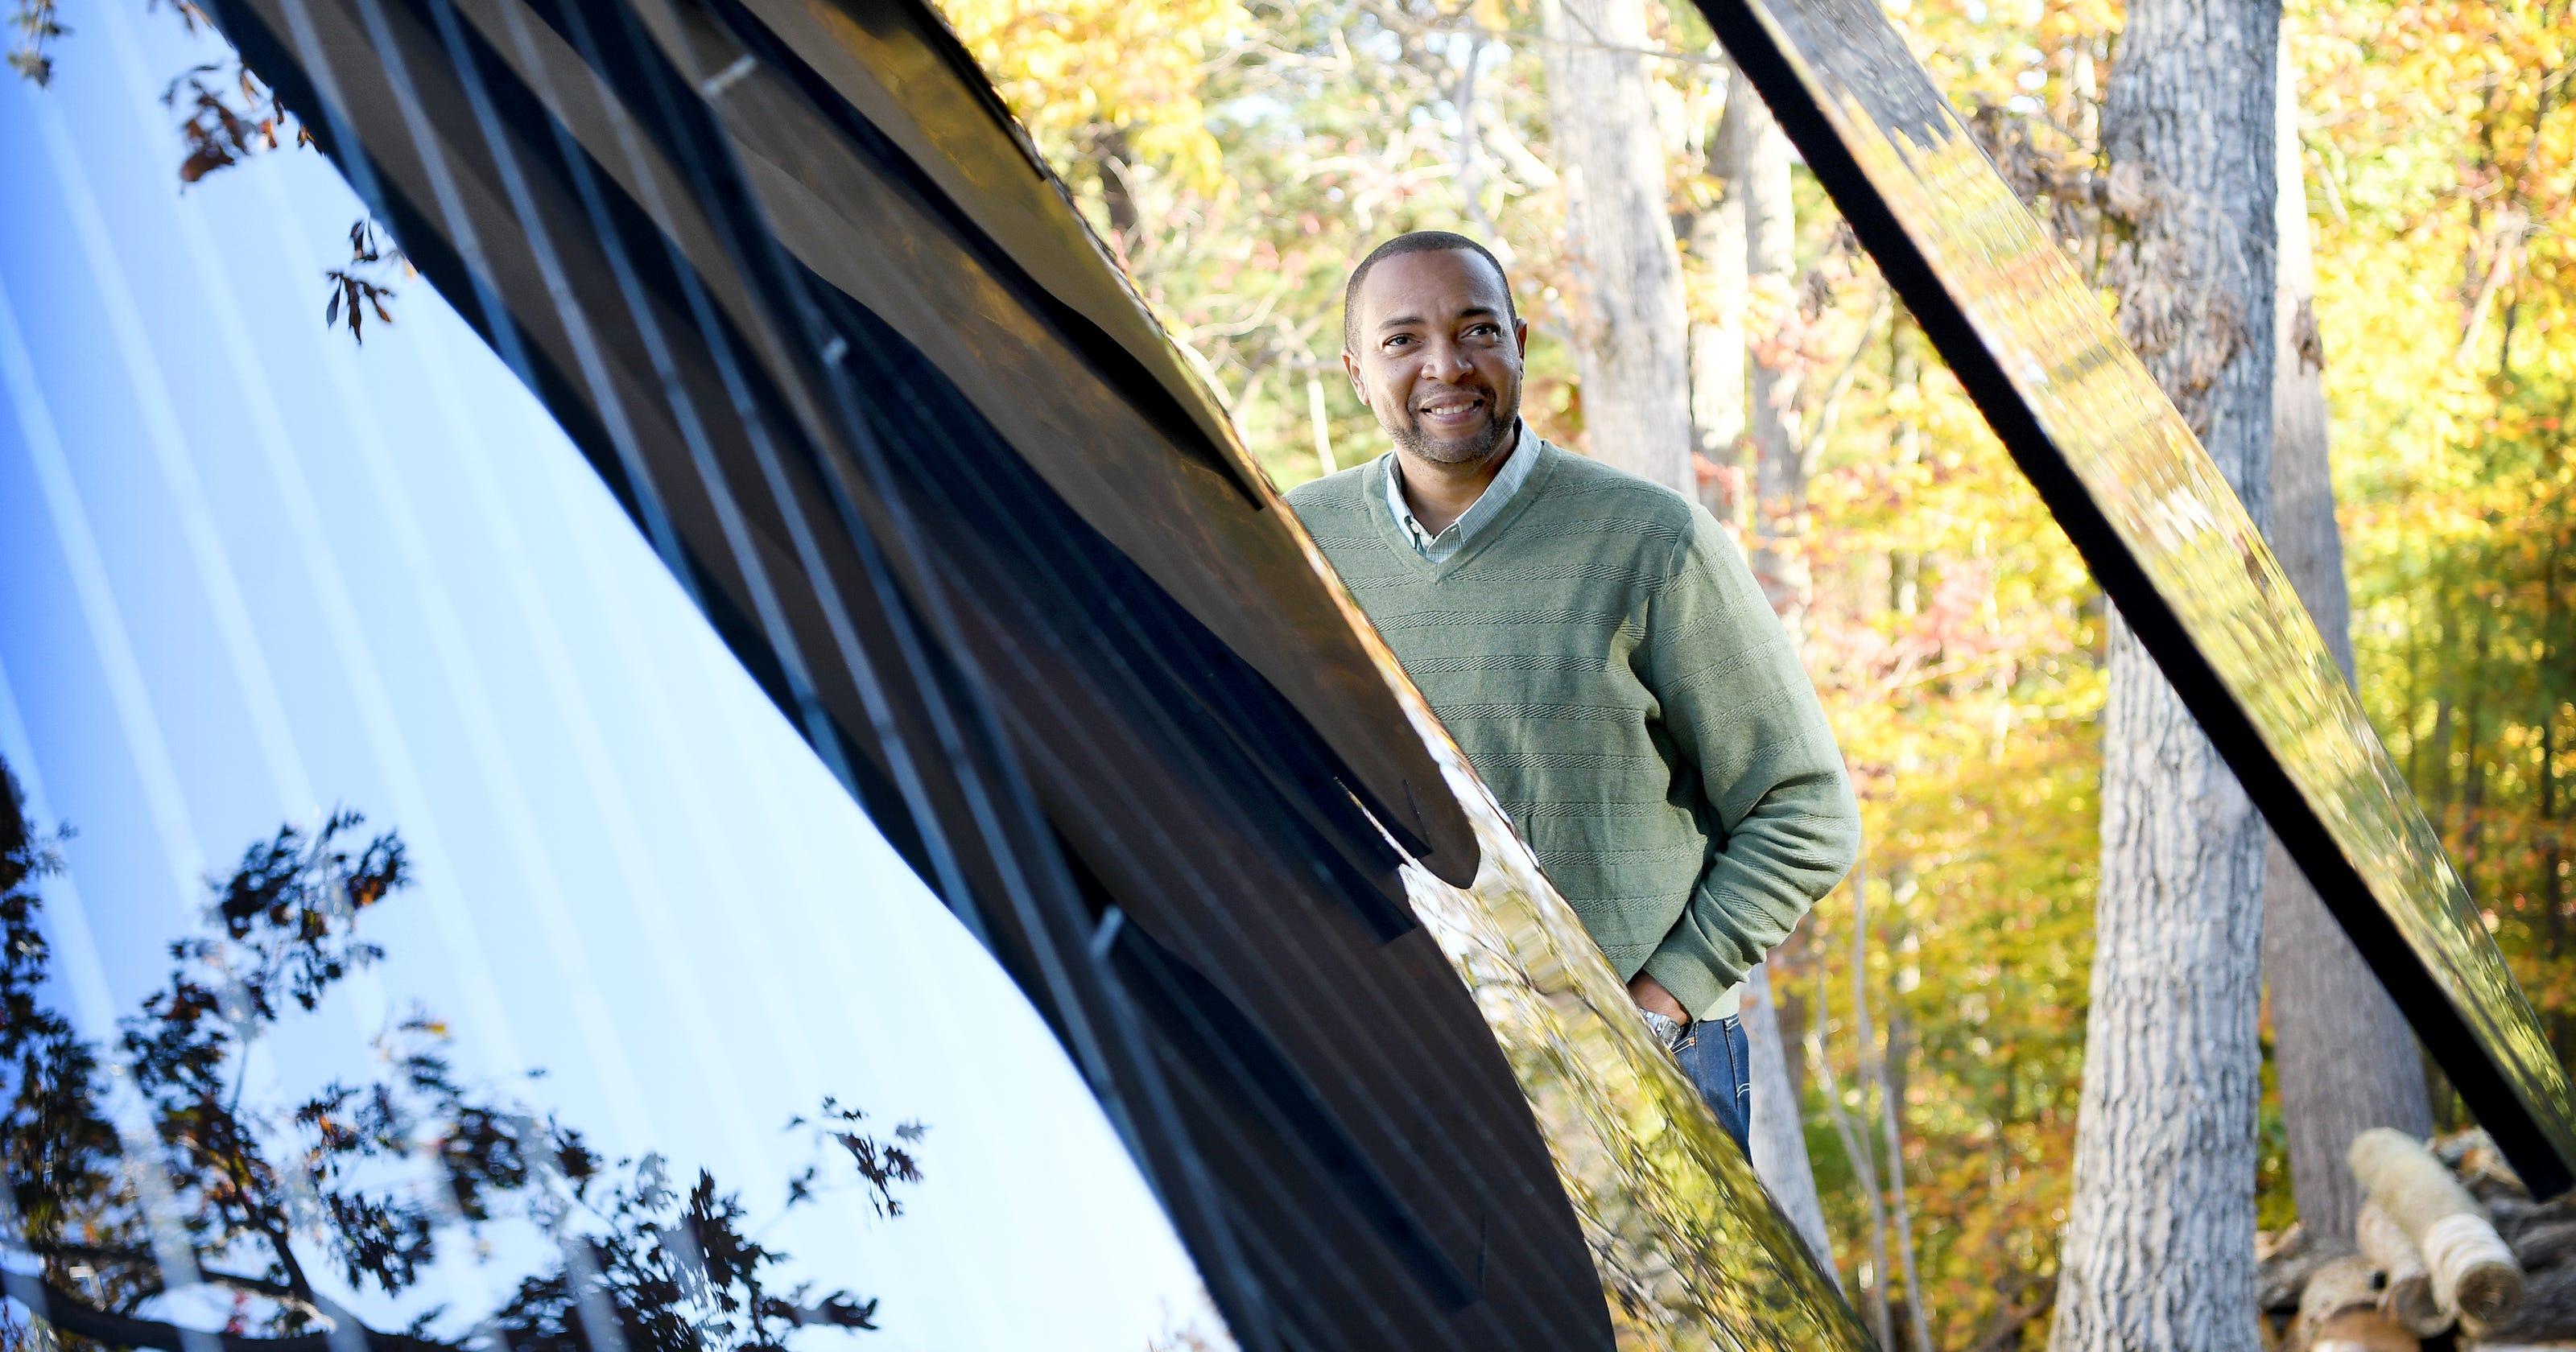 SmartFlower blooms renewable energy ideas in North Asheville